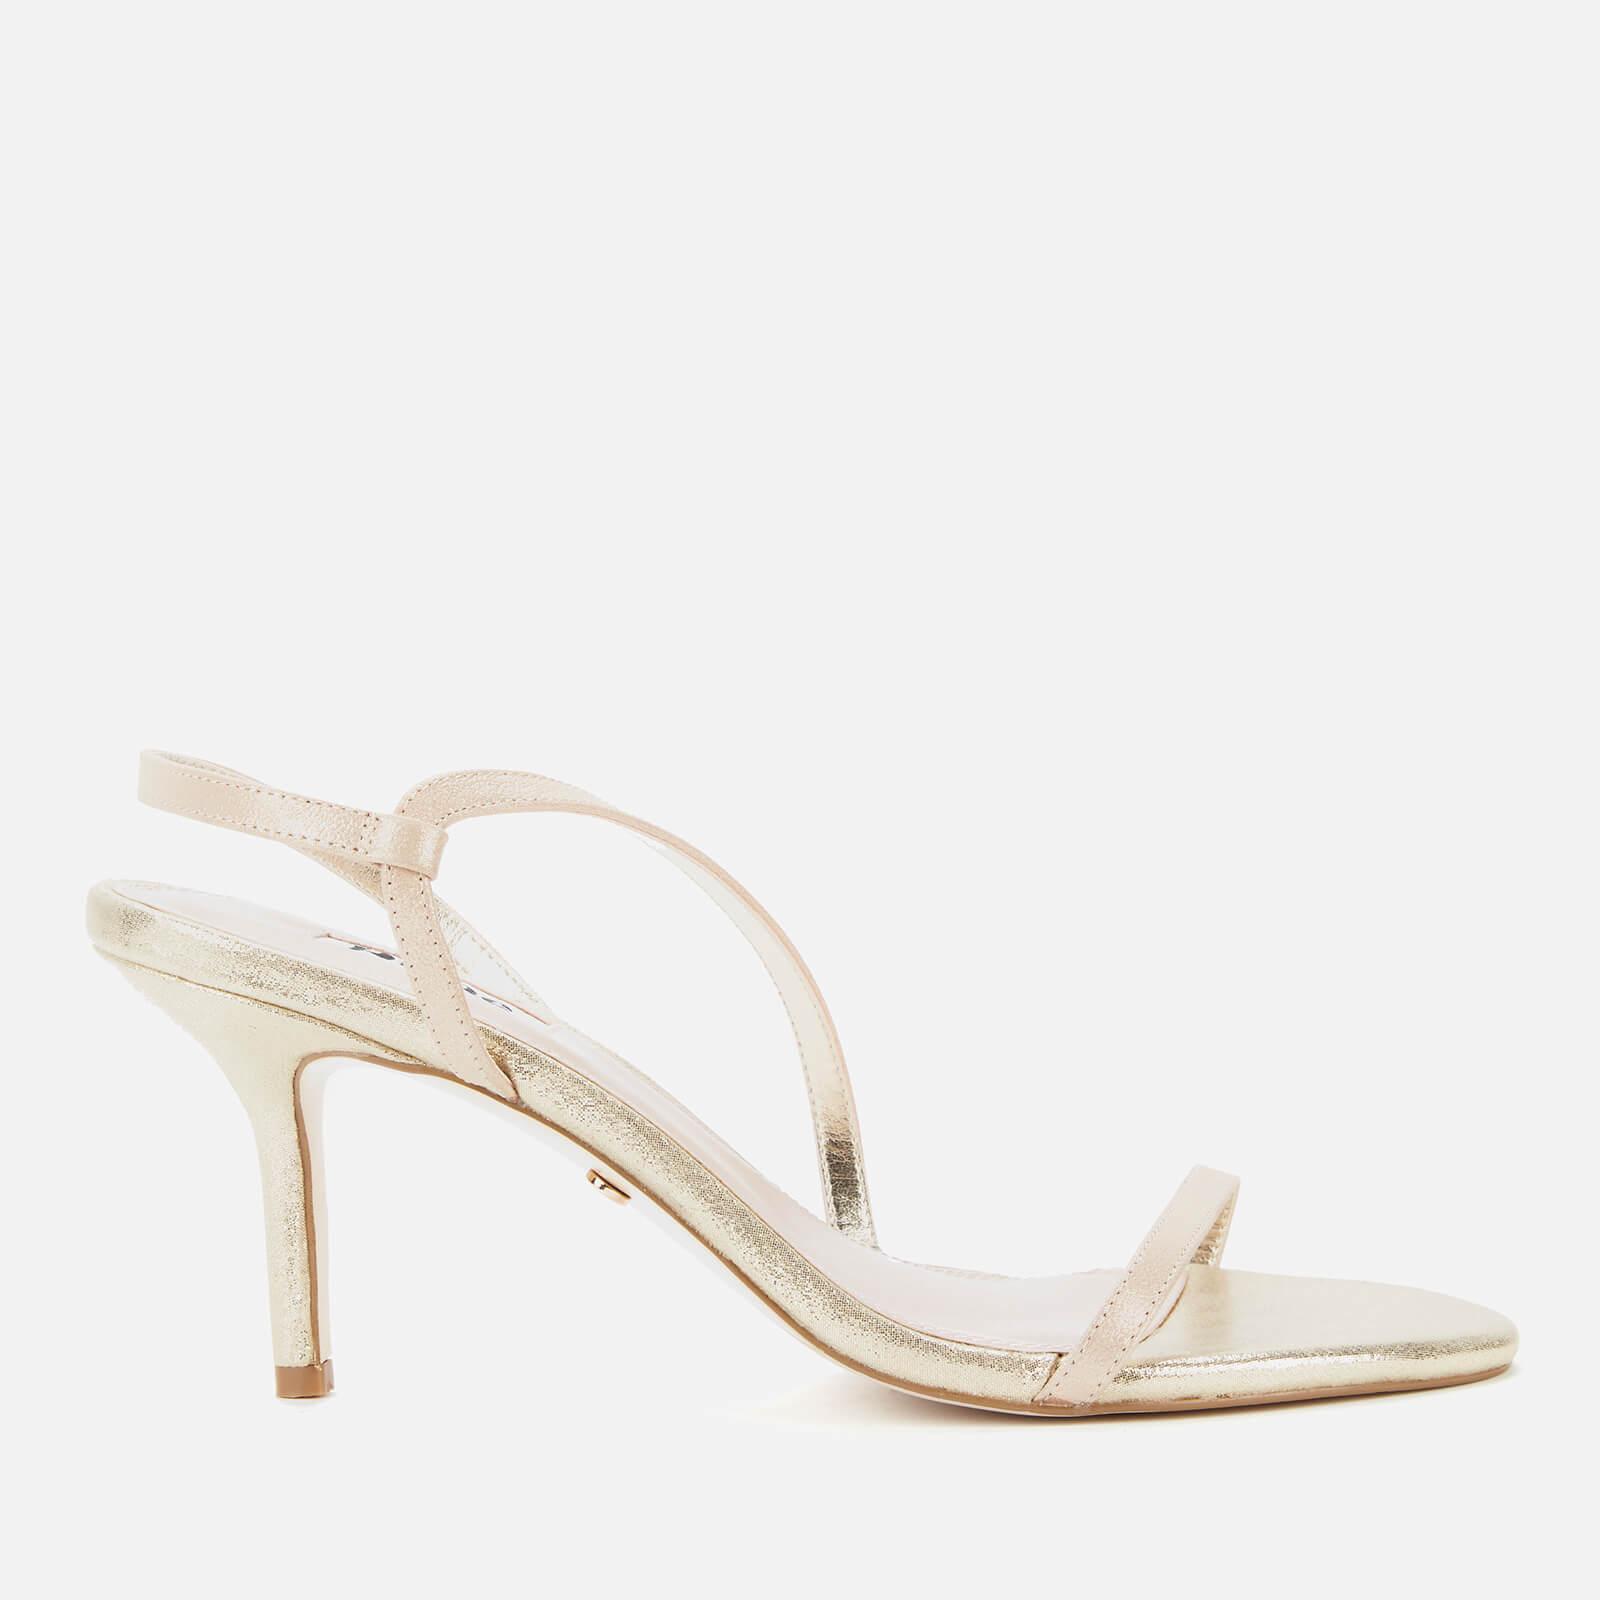 Dune Women's Mojos Leather Strappy Heels - Gold - EU 36/UK 3